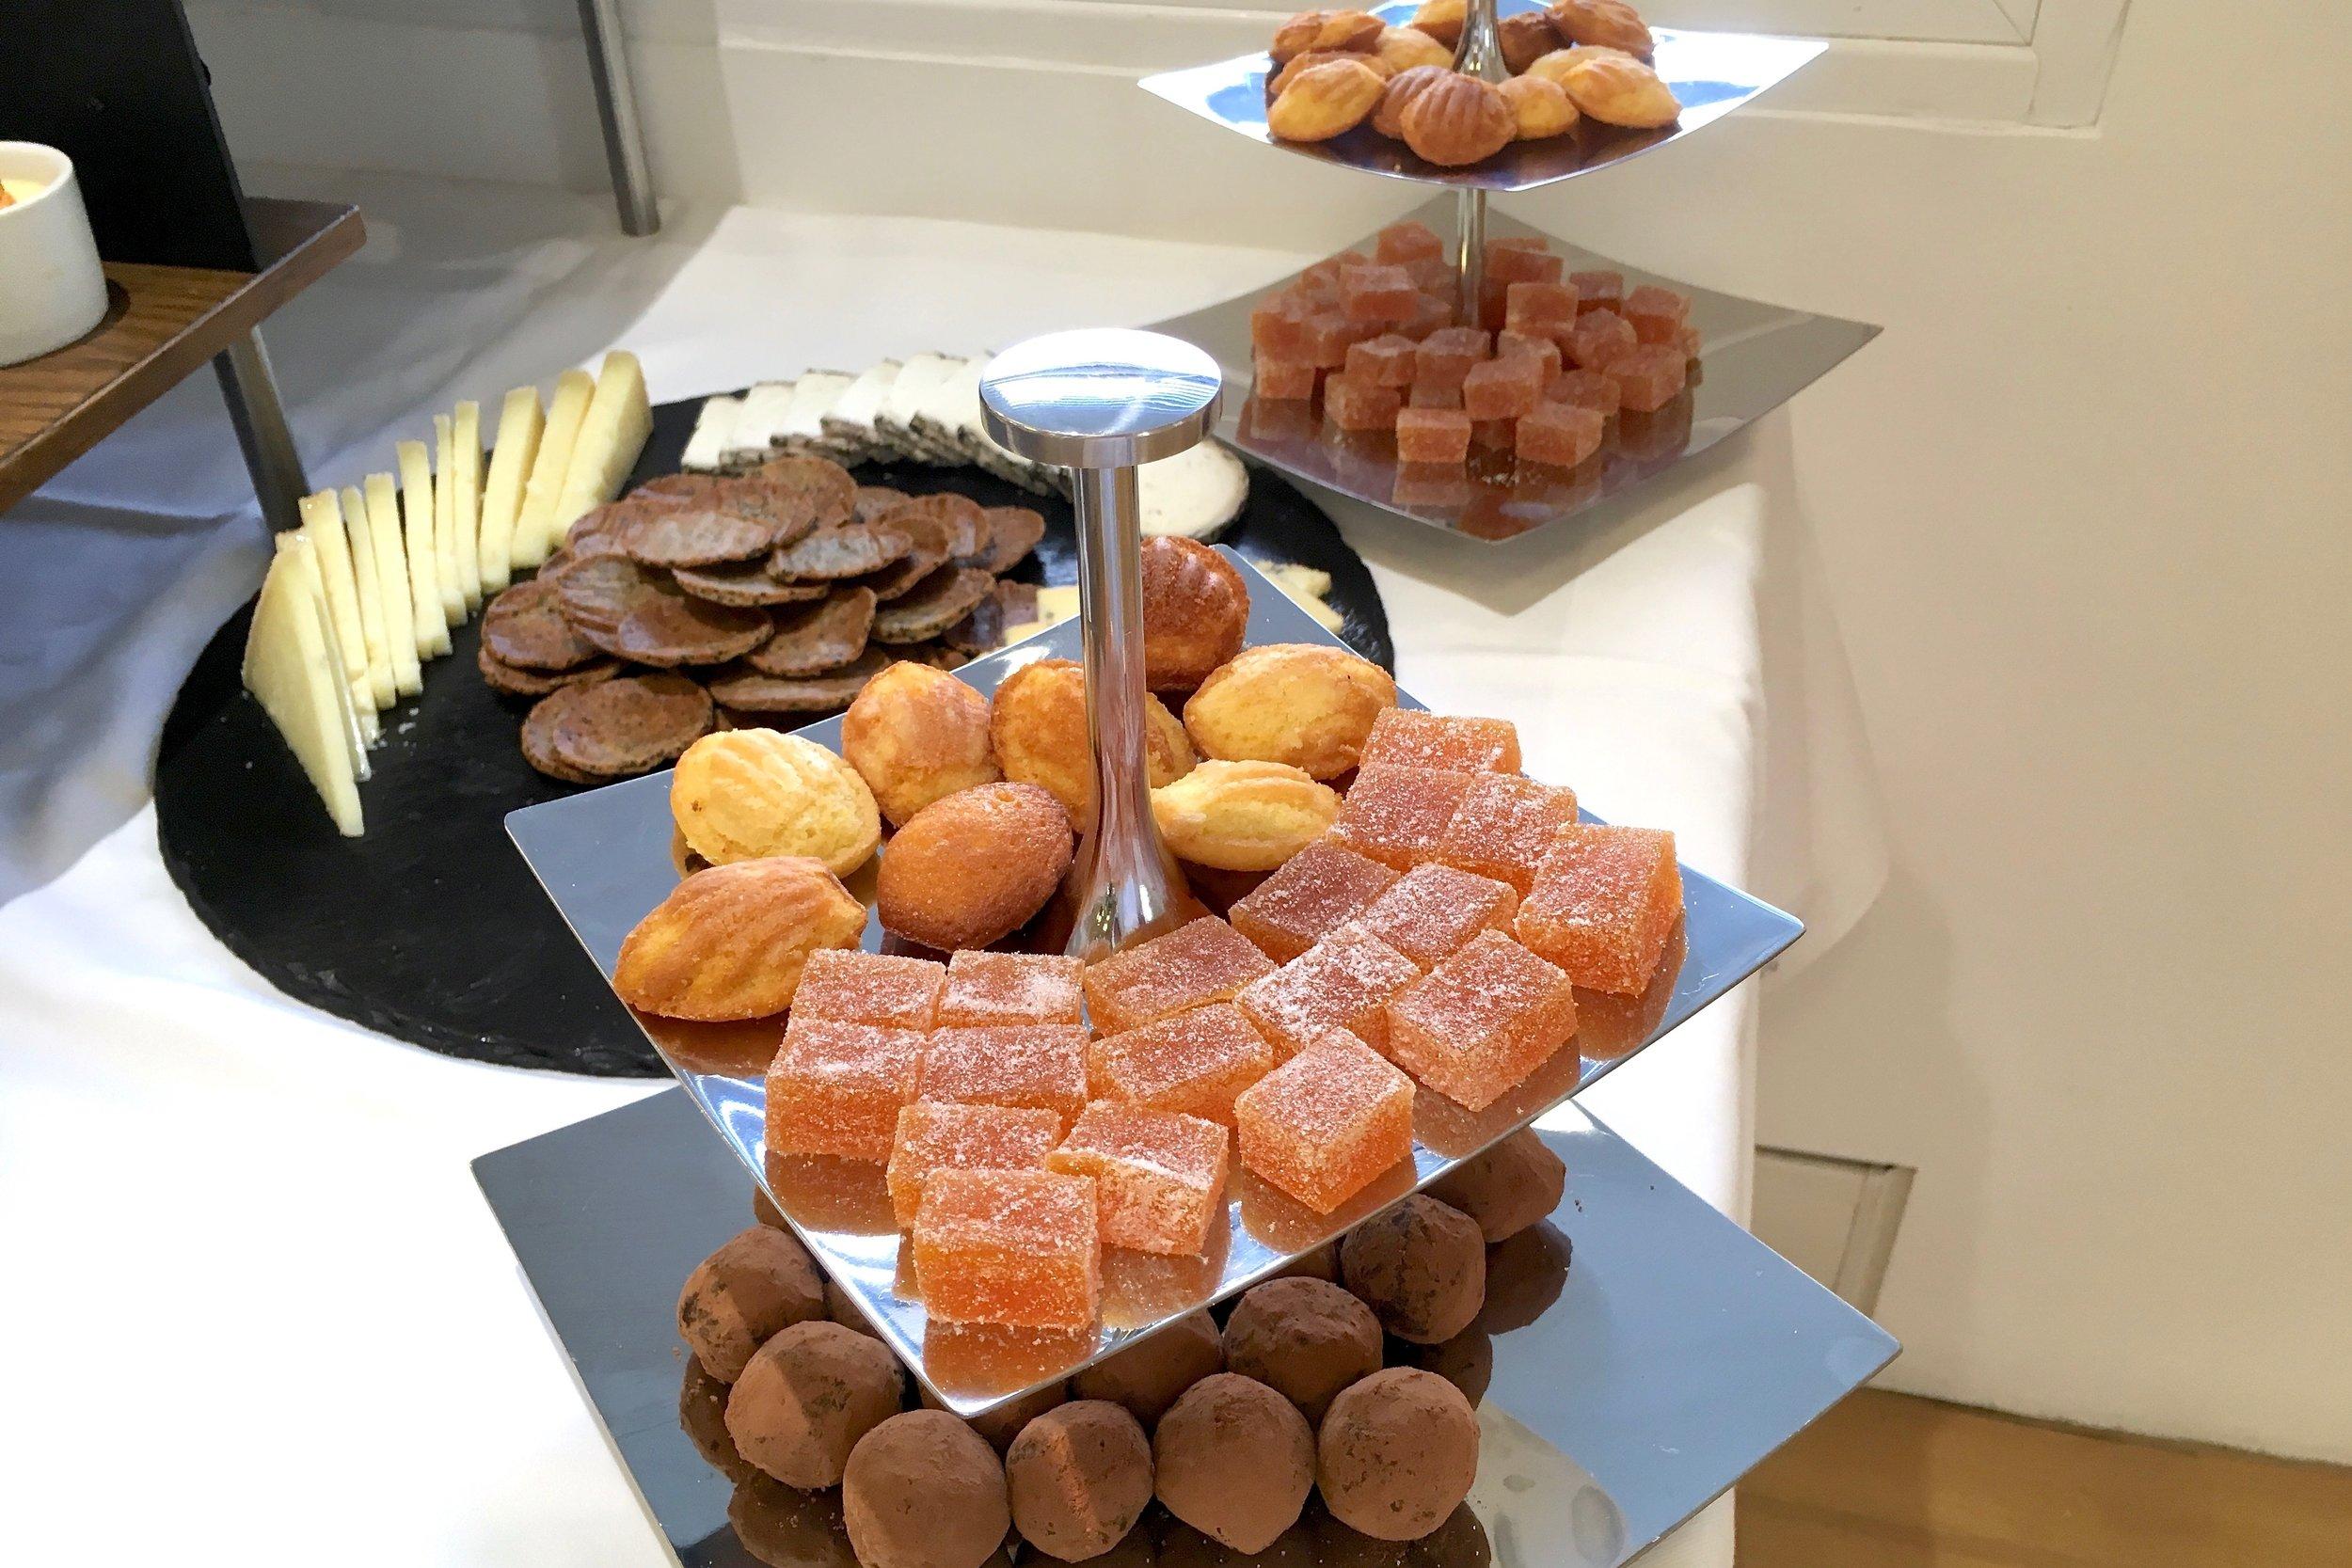 Madeleines, fruit jellies and chocolate truffles